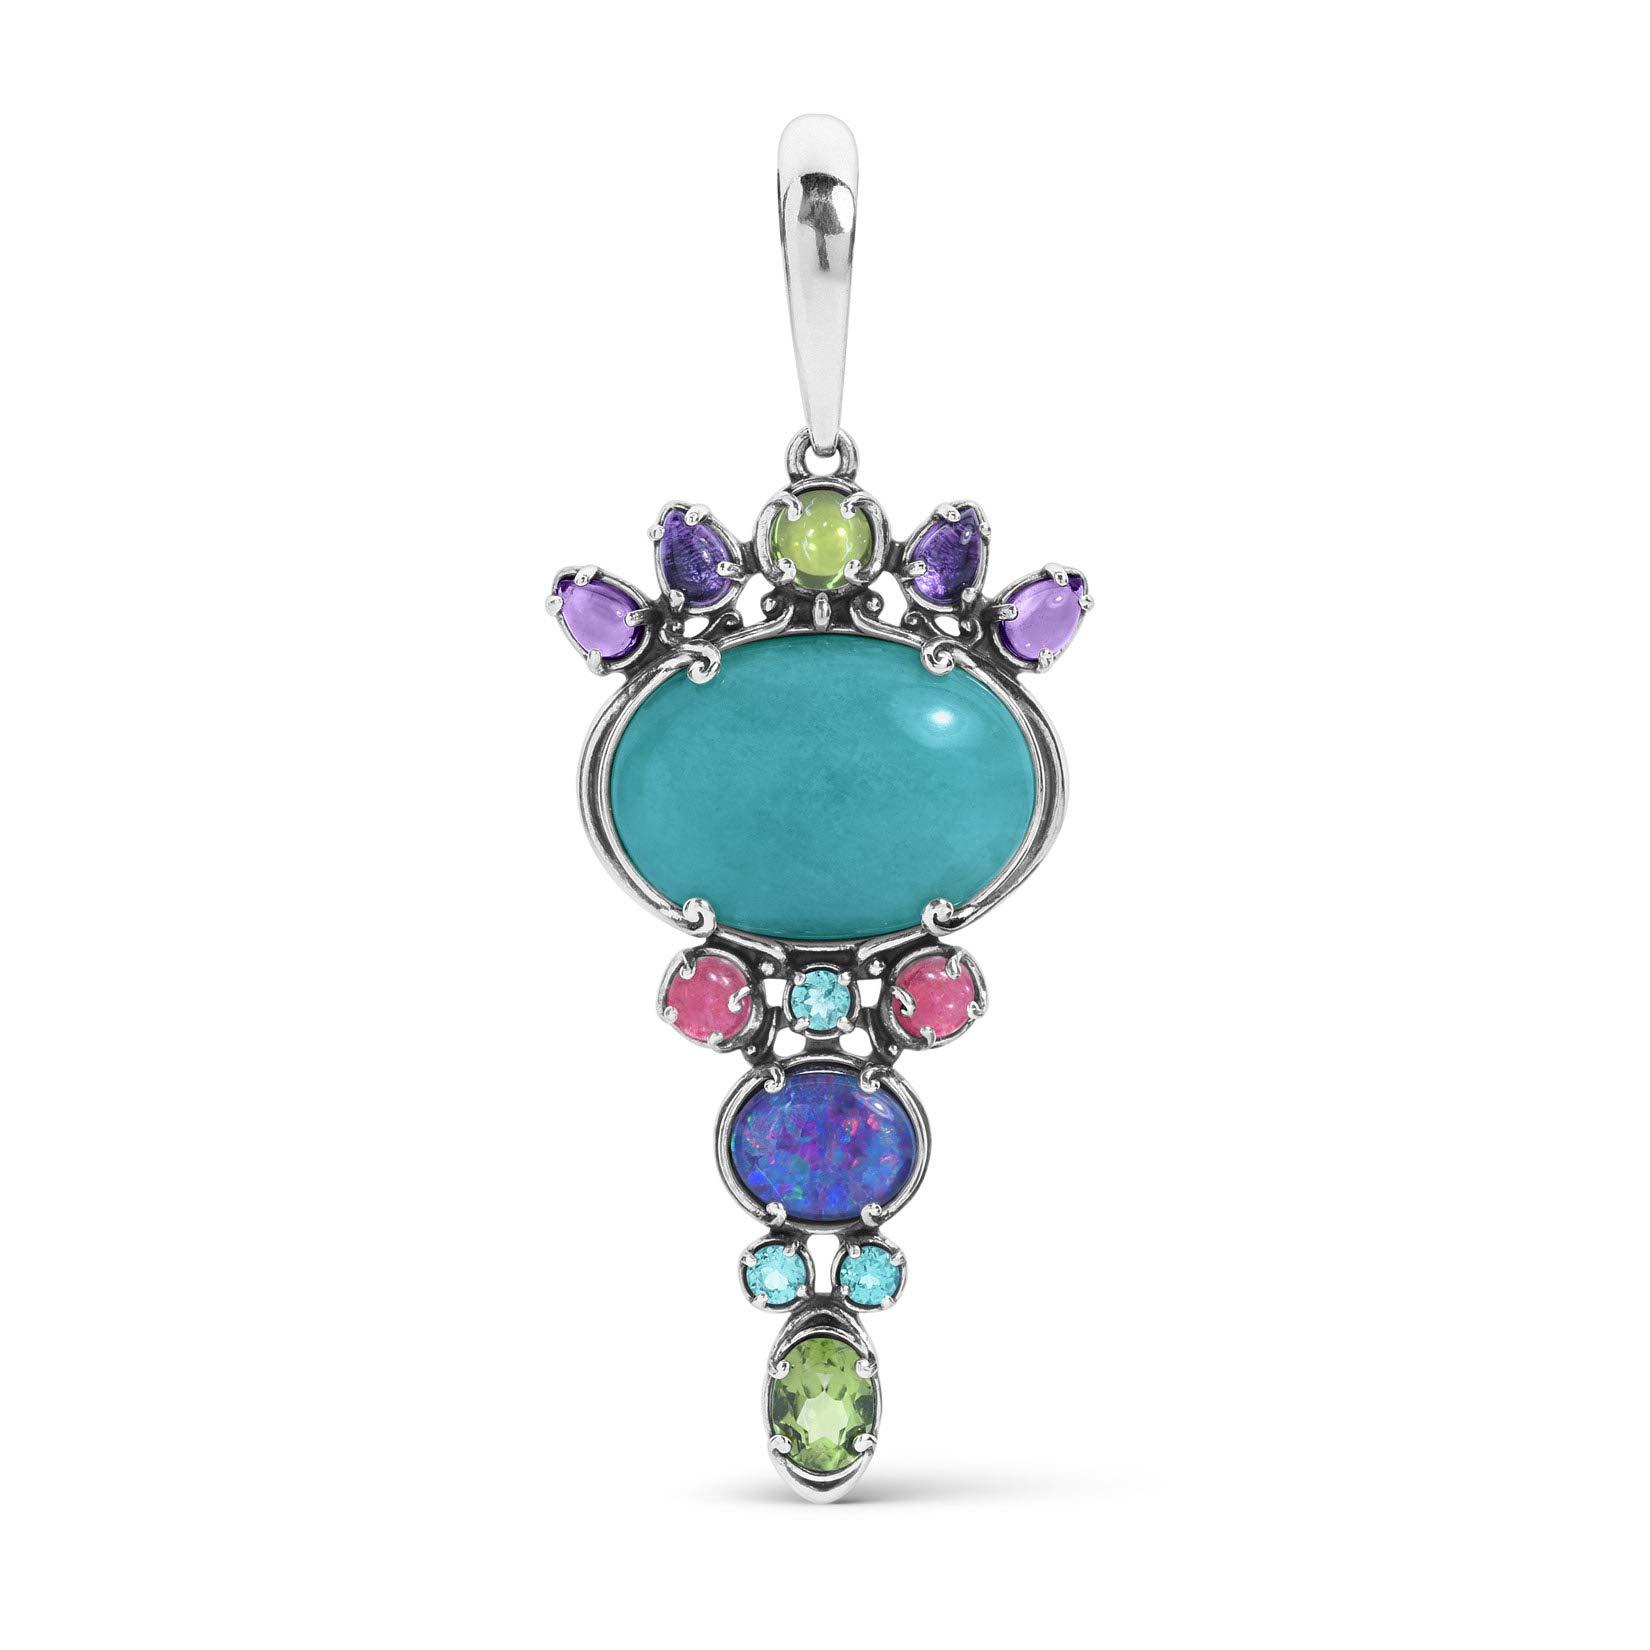 Carolyn Pollack Sterling Silver Gemstone Pendant Enhancer with Pastel Color Stones